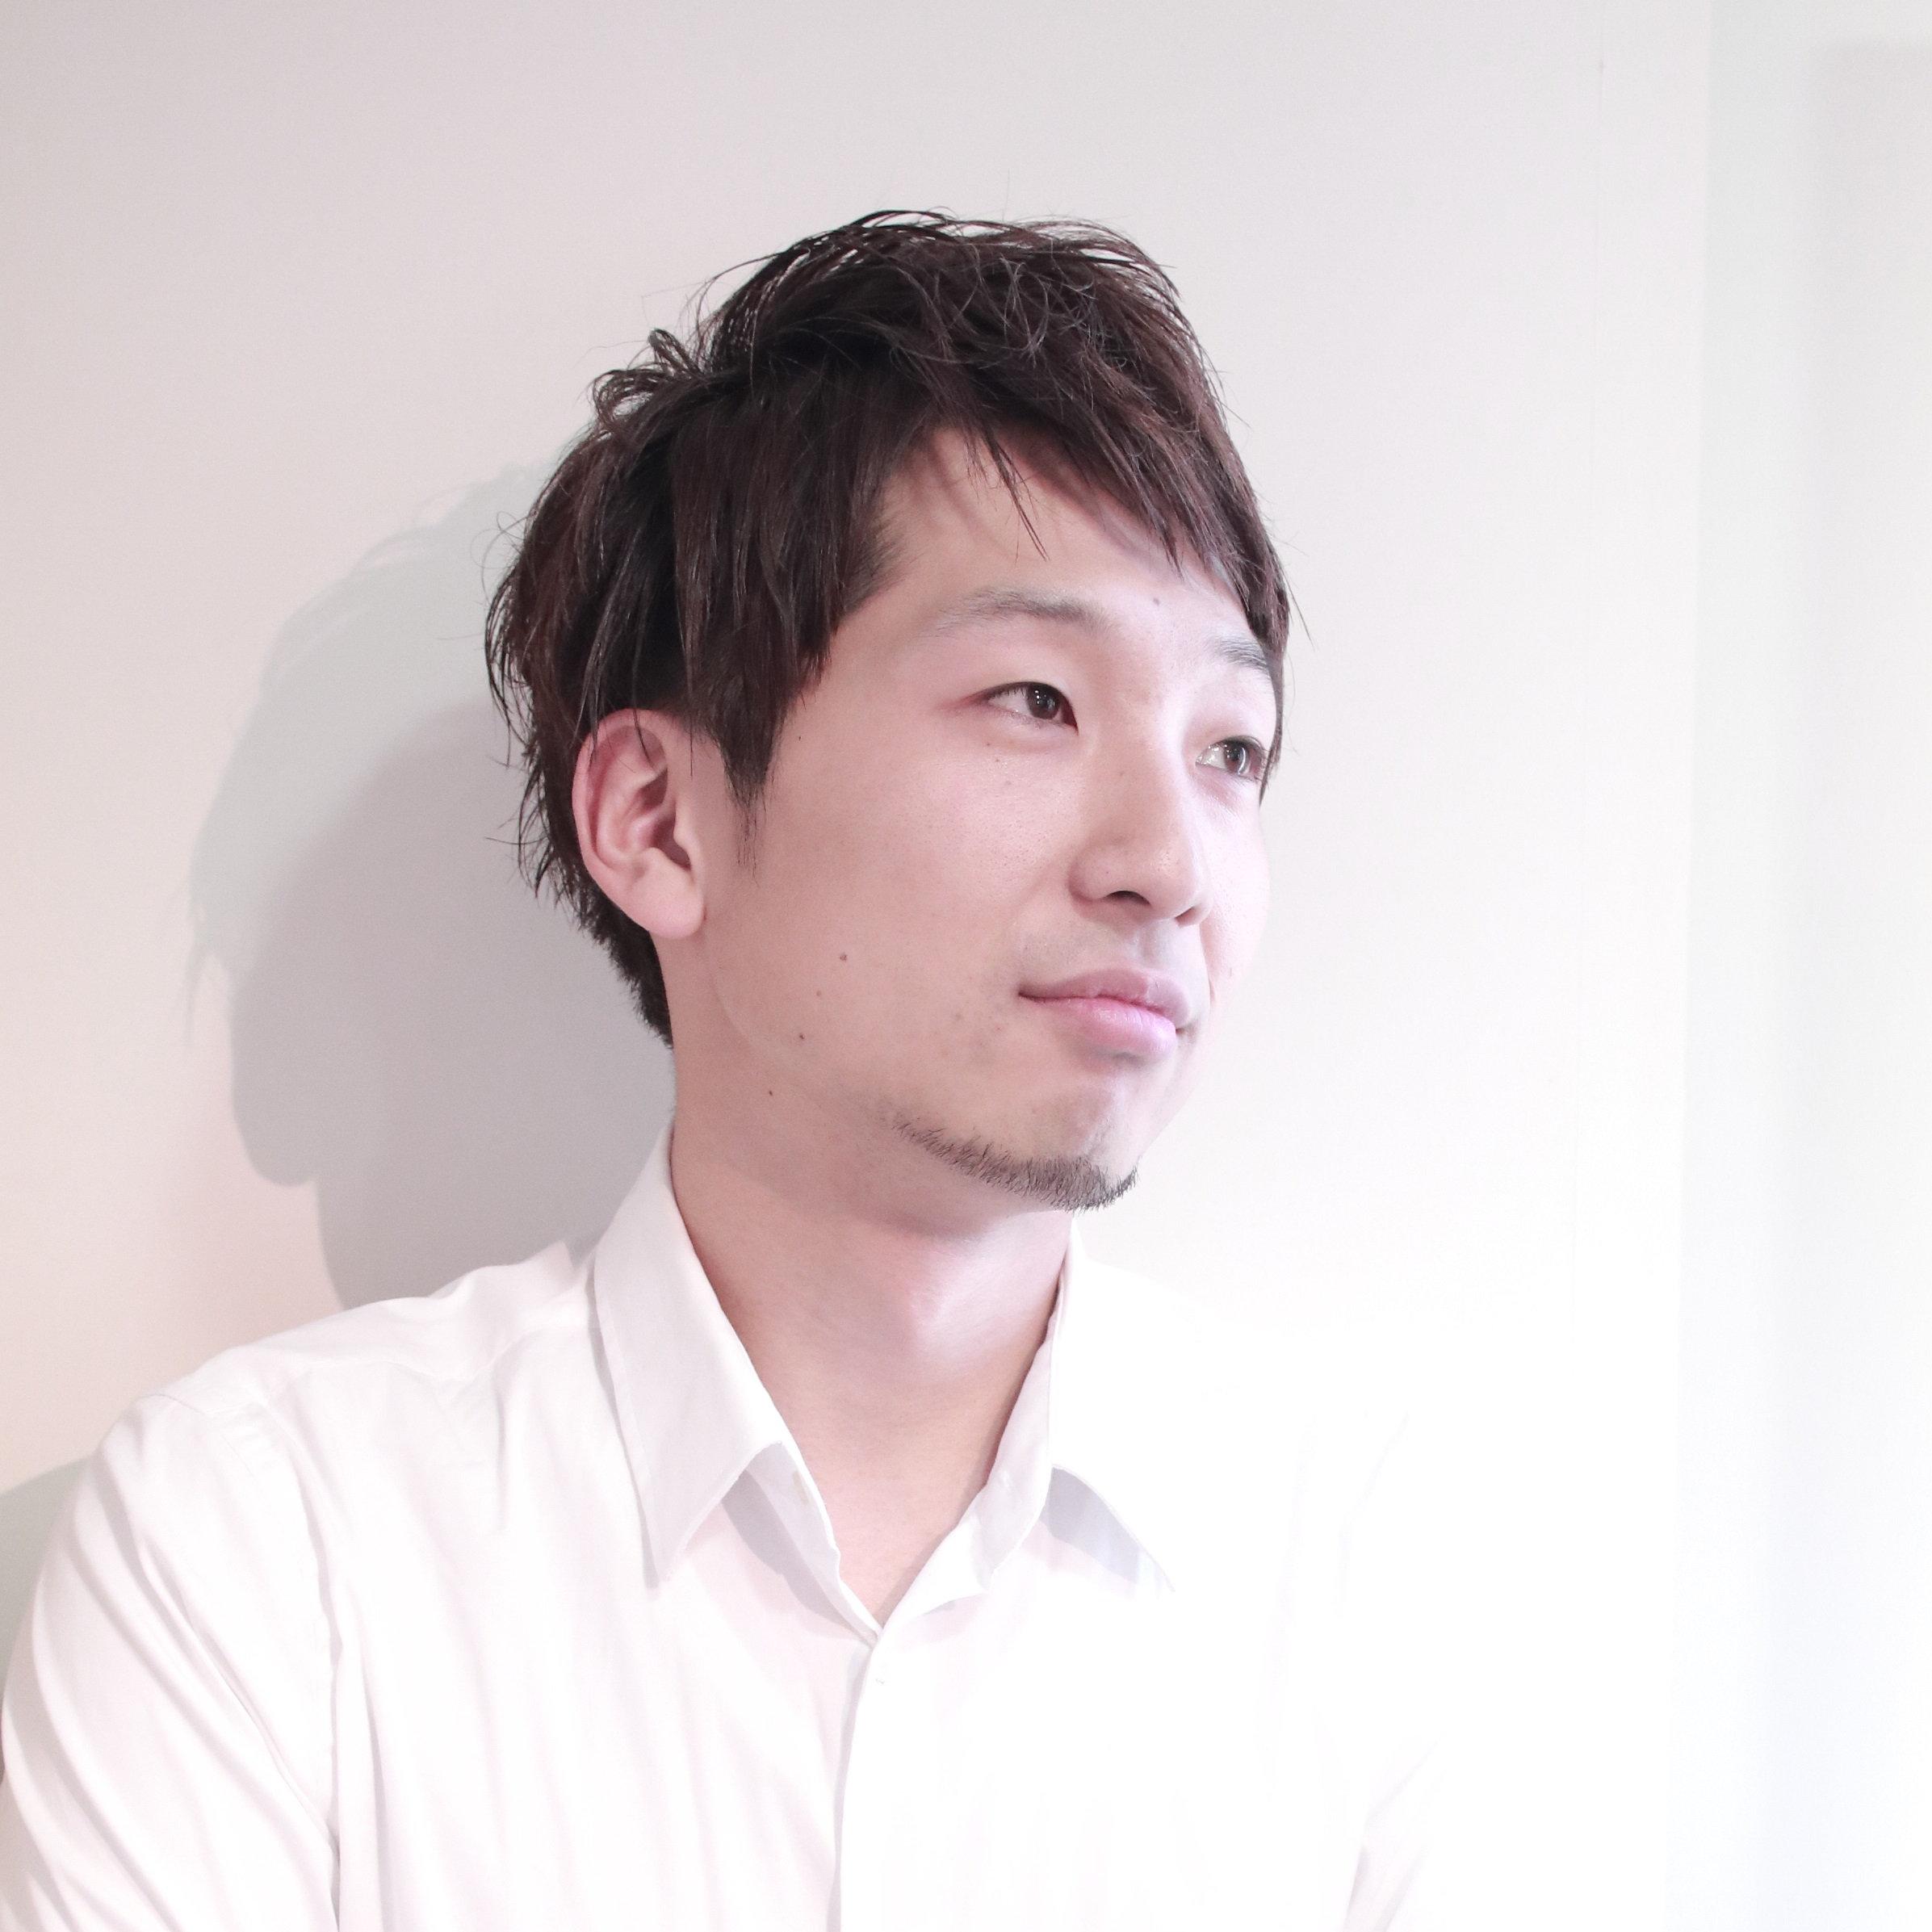 TAKESHI BOU